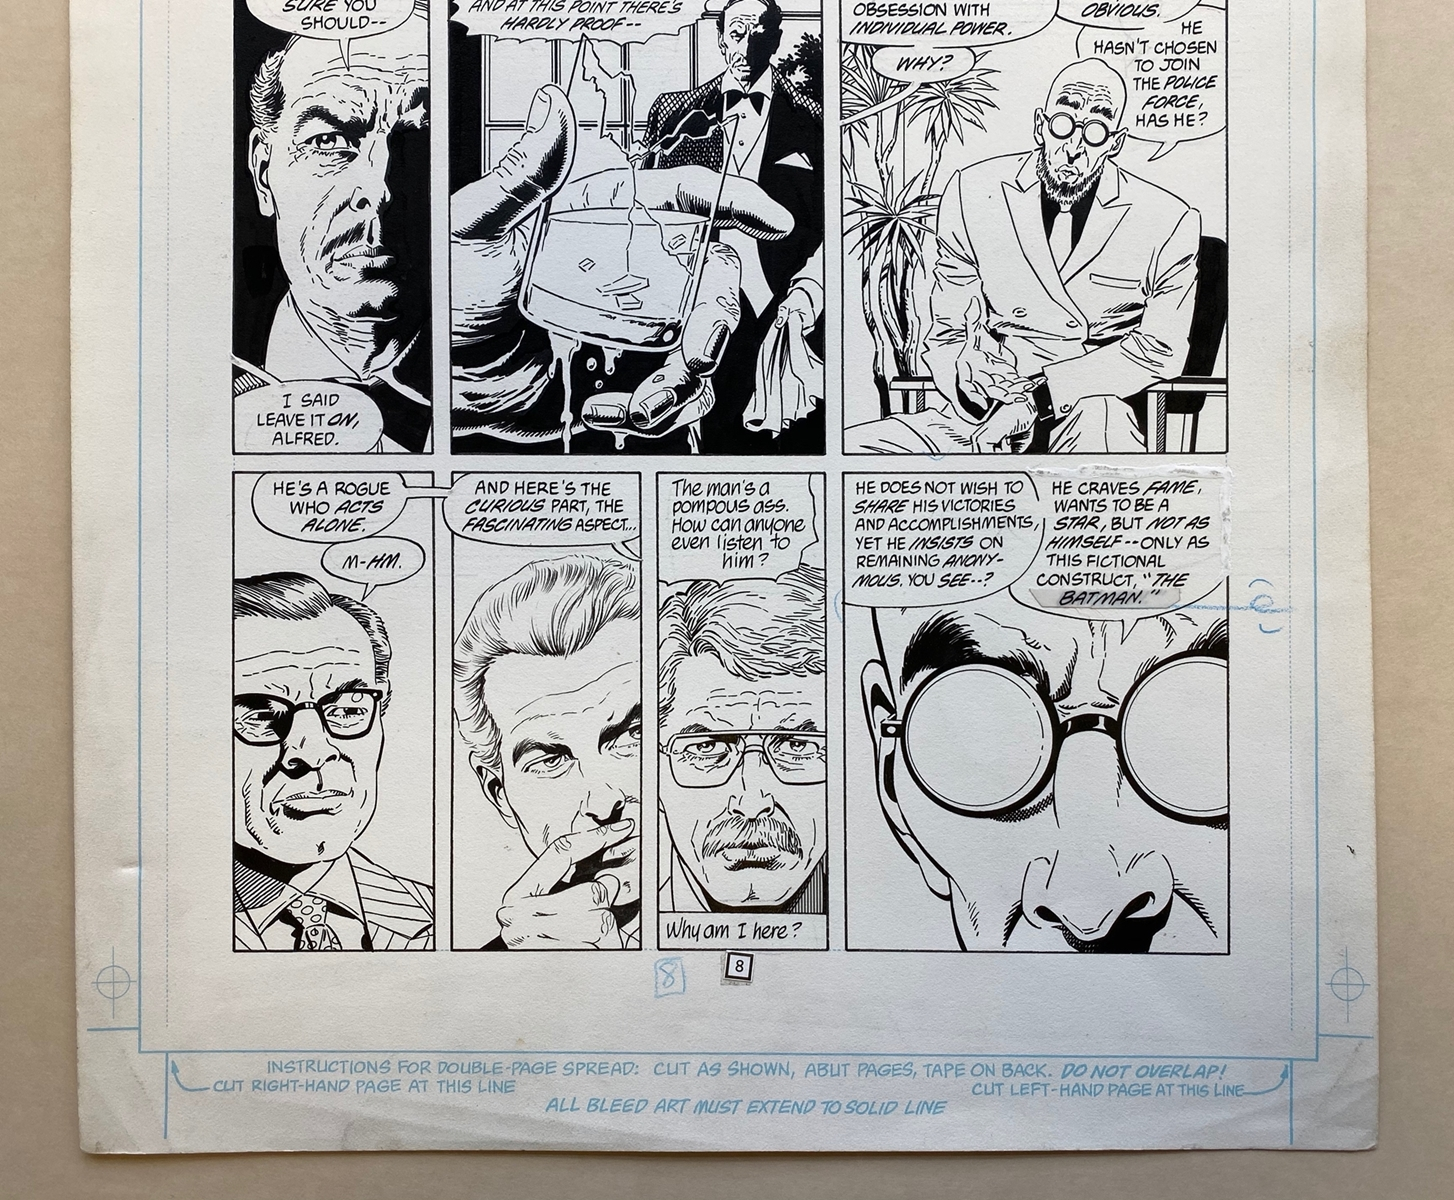 Lot 2198 - BATMAN: LEGEND OF THE DARK KNIGHT #11 (1990) - ORIGINAL ARTWORK - PAUL GULACY (Artist) - Page 8 (